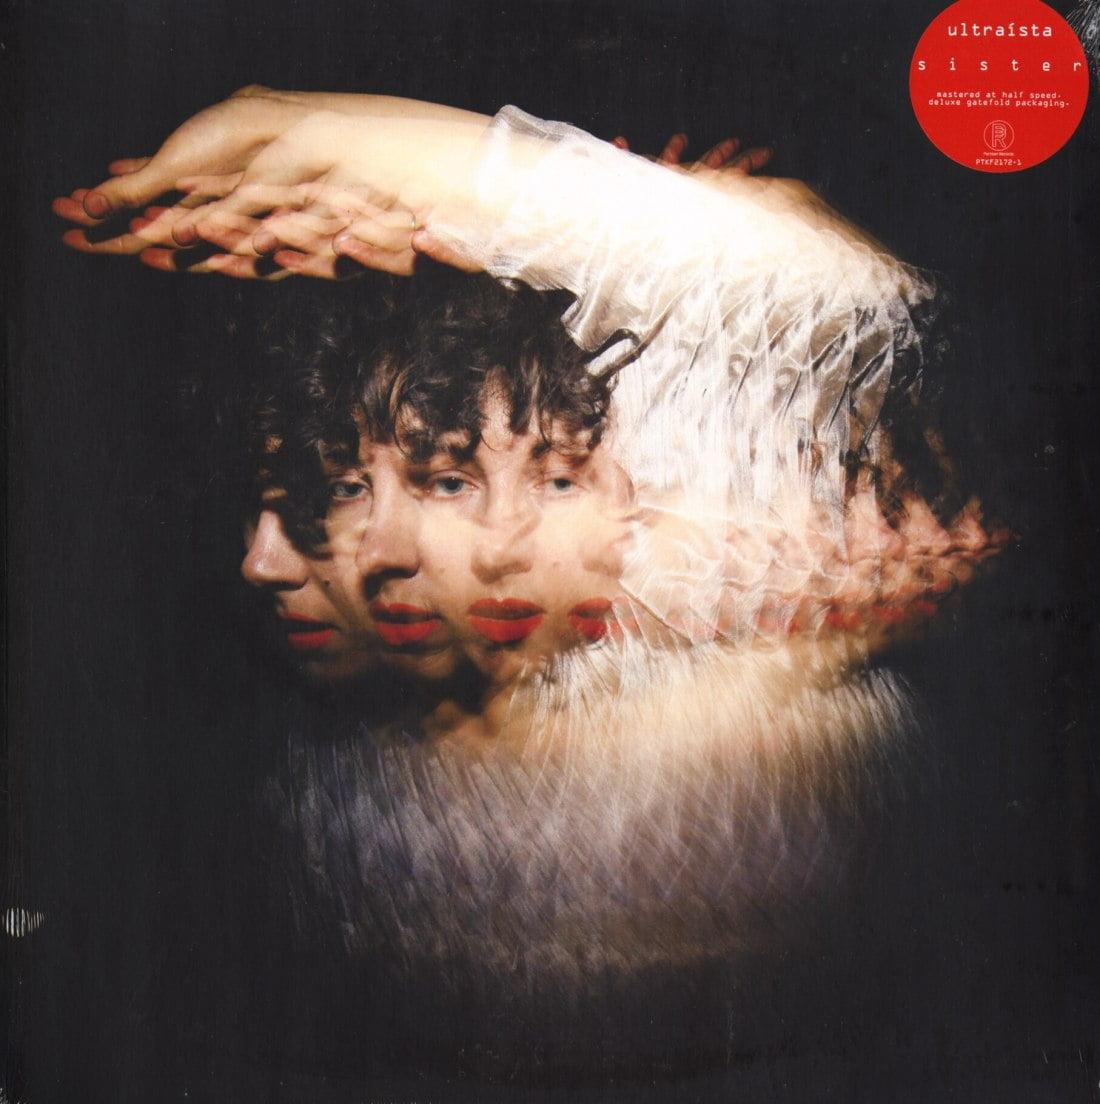 Ultraista - Sister - Vinyl, LP, Gatefold Jacket, Partisan Records, 2020